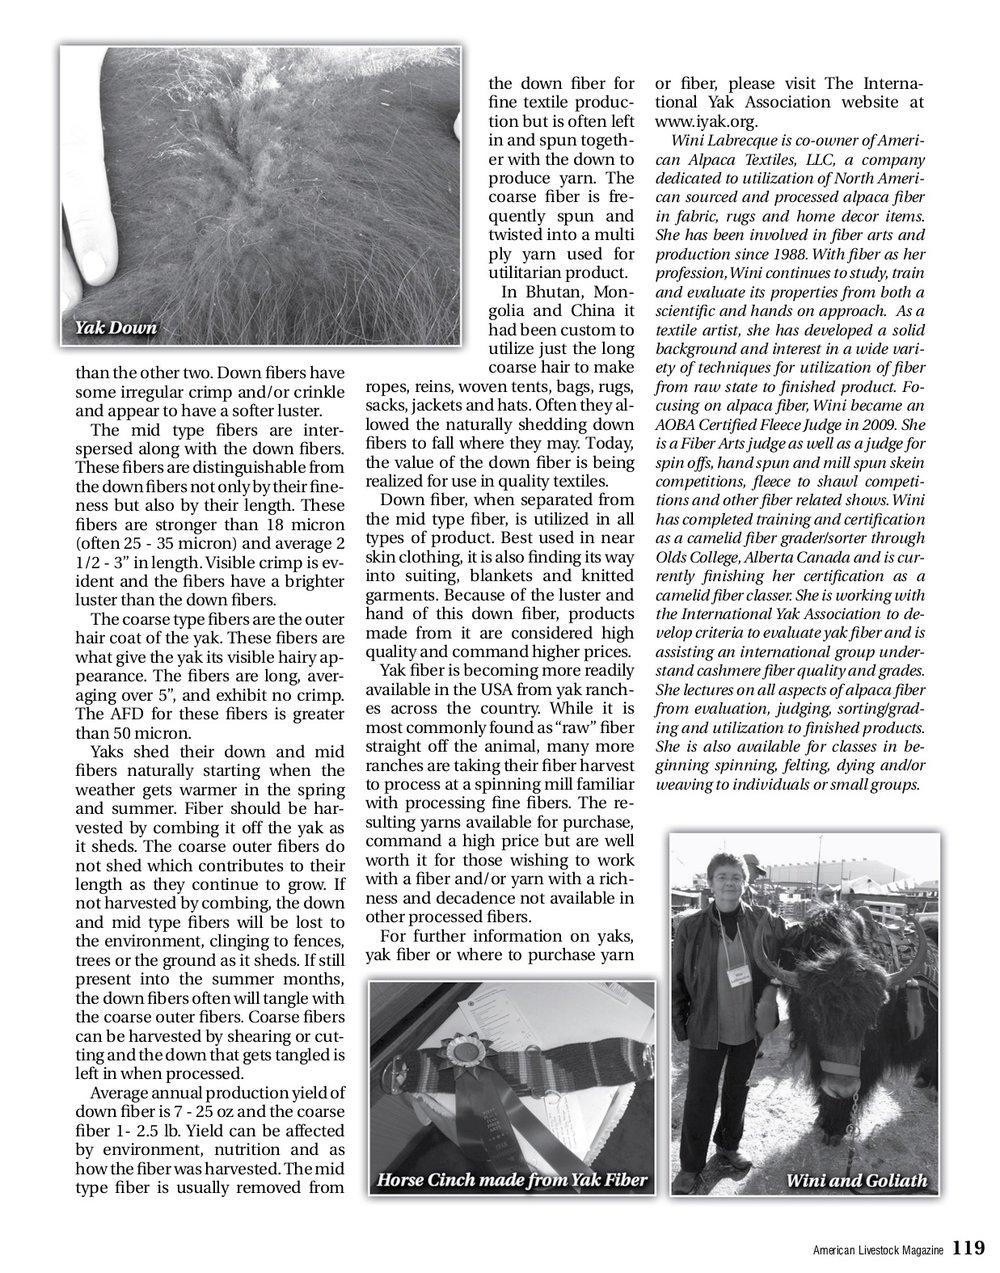 Yak Article 2012 copy.png